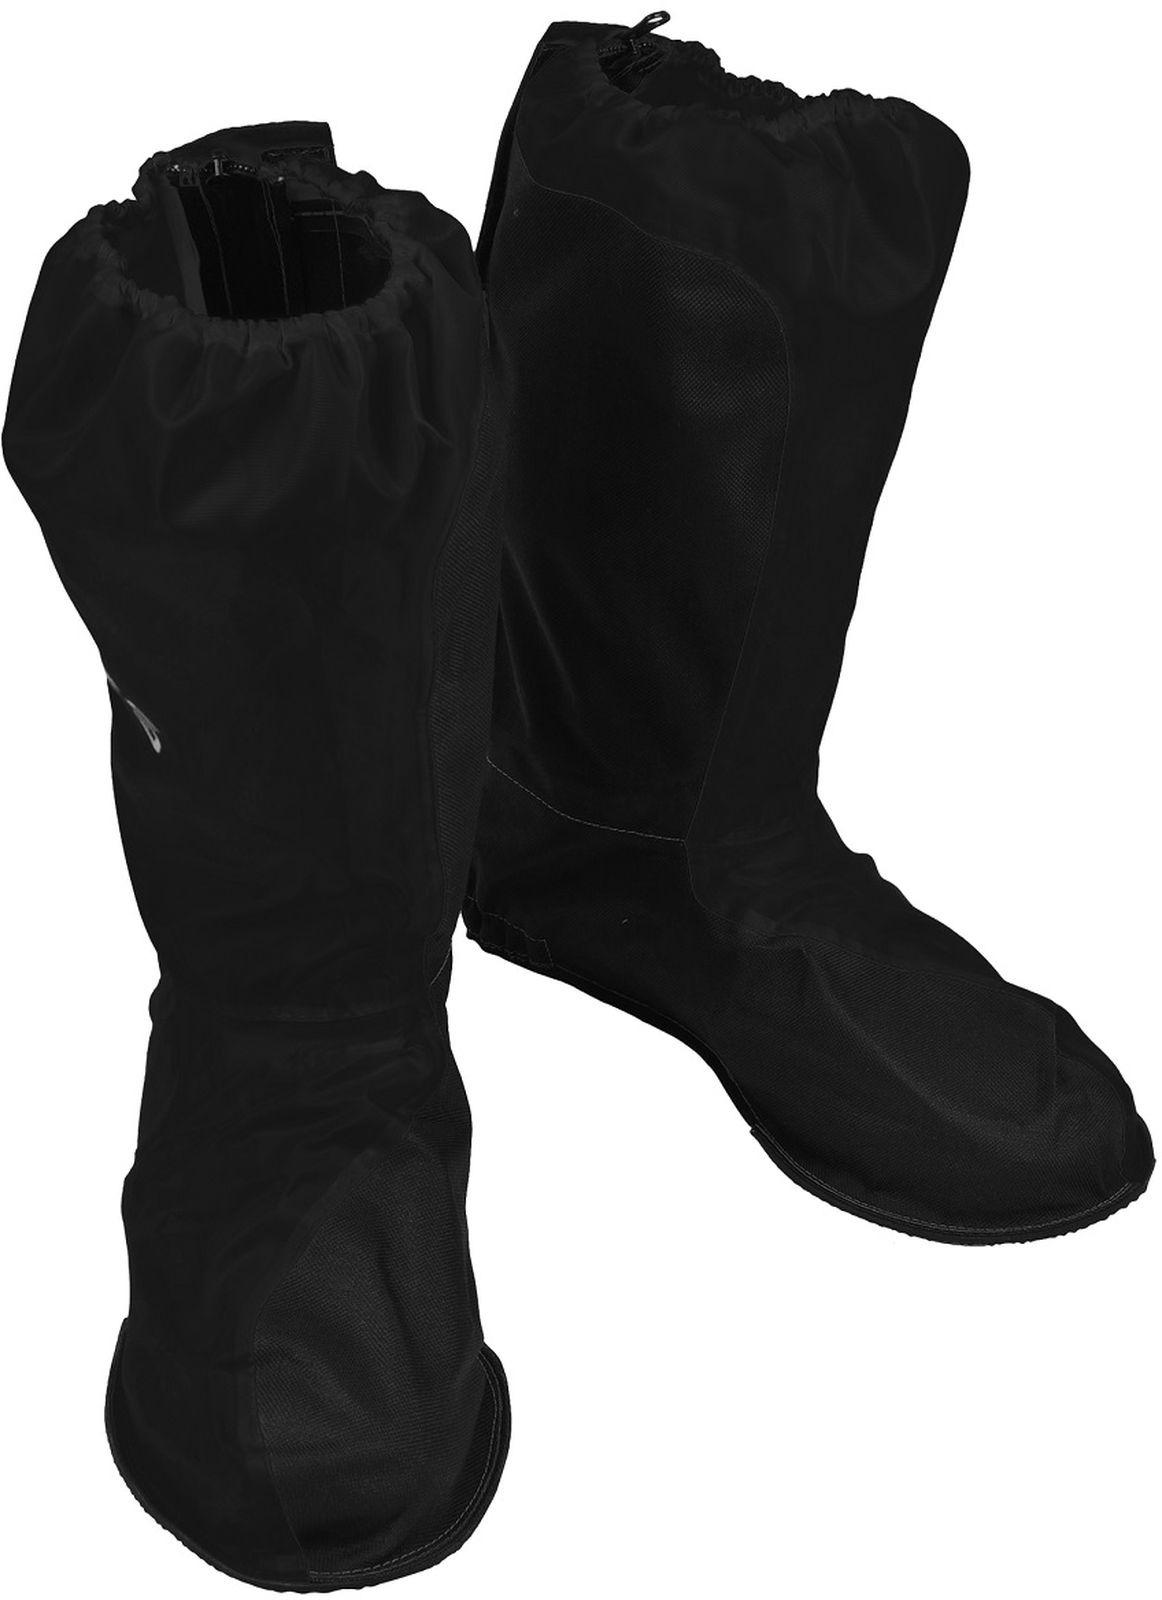 Мотодождевик Starks Rain Boots, LC0054, черный, размер L